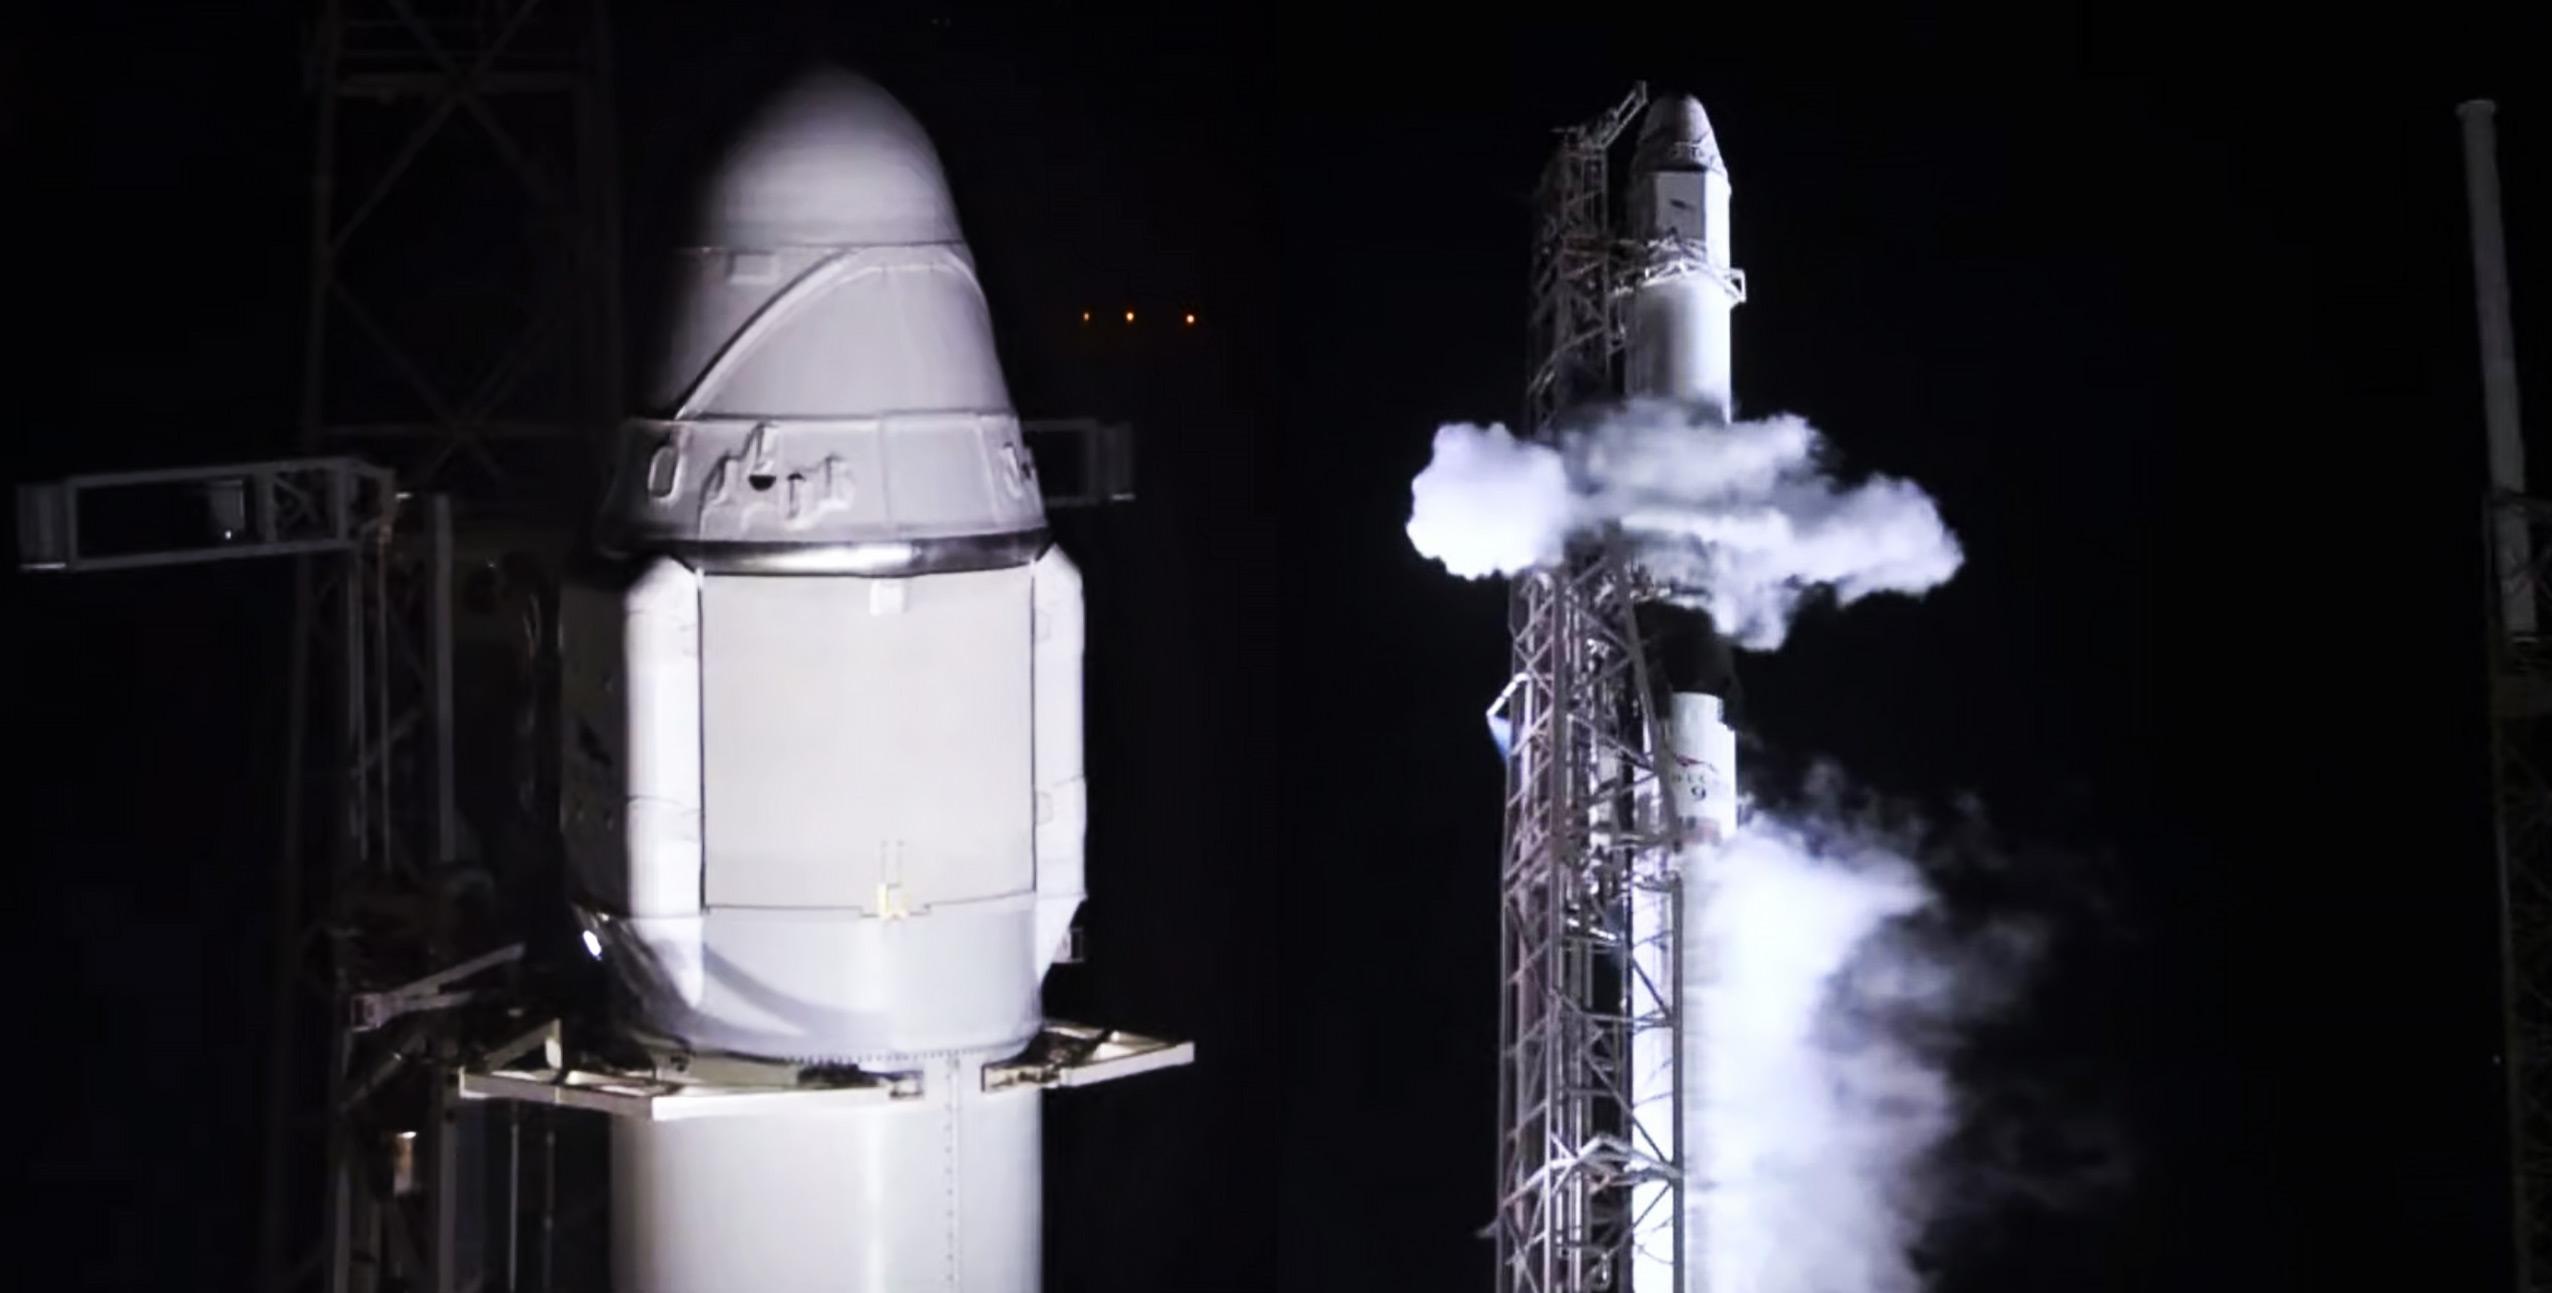 CRS-17 Falcon 9 B1056 scrub (SpaceX) feature 1